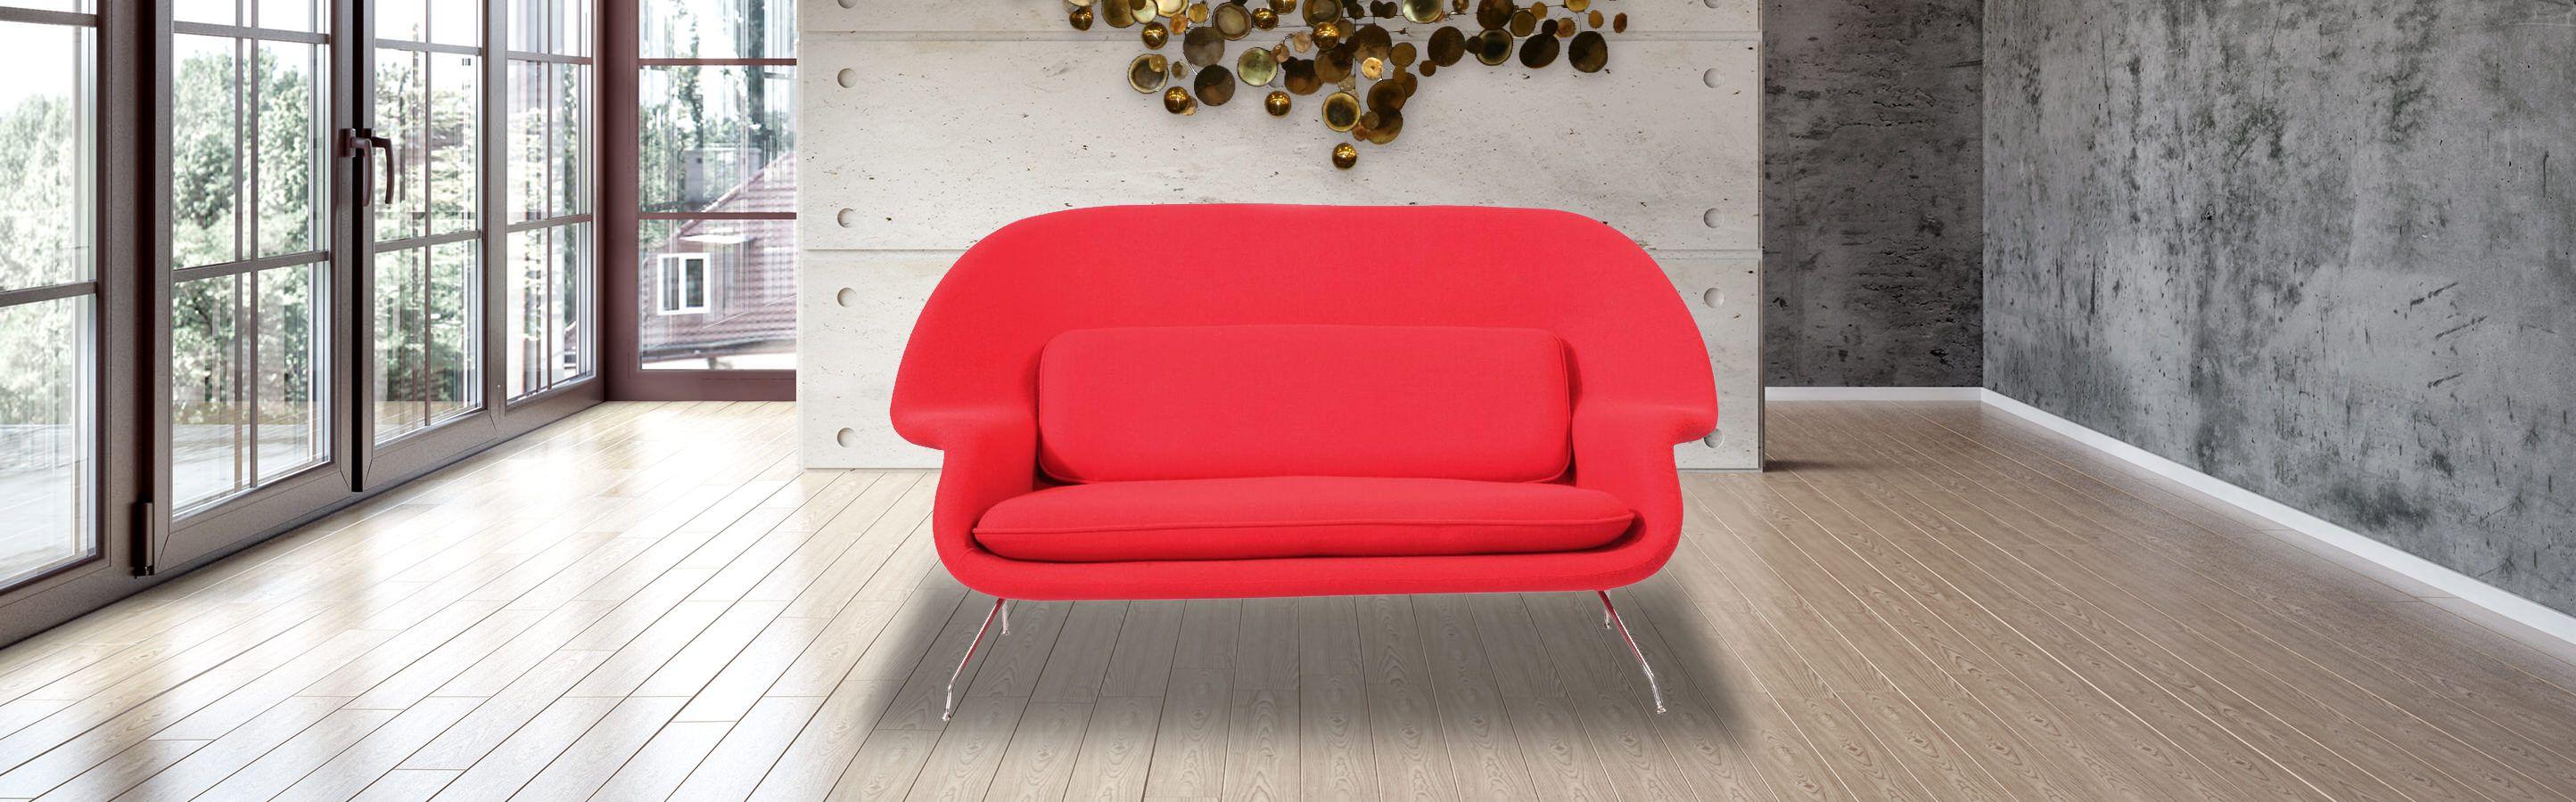 Eero Saarinen Womb Chair Womb Loveseat Womb Sofa